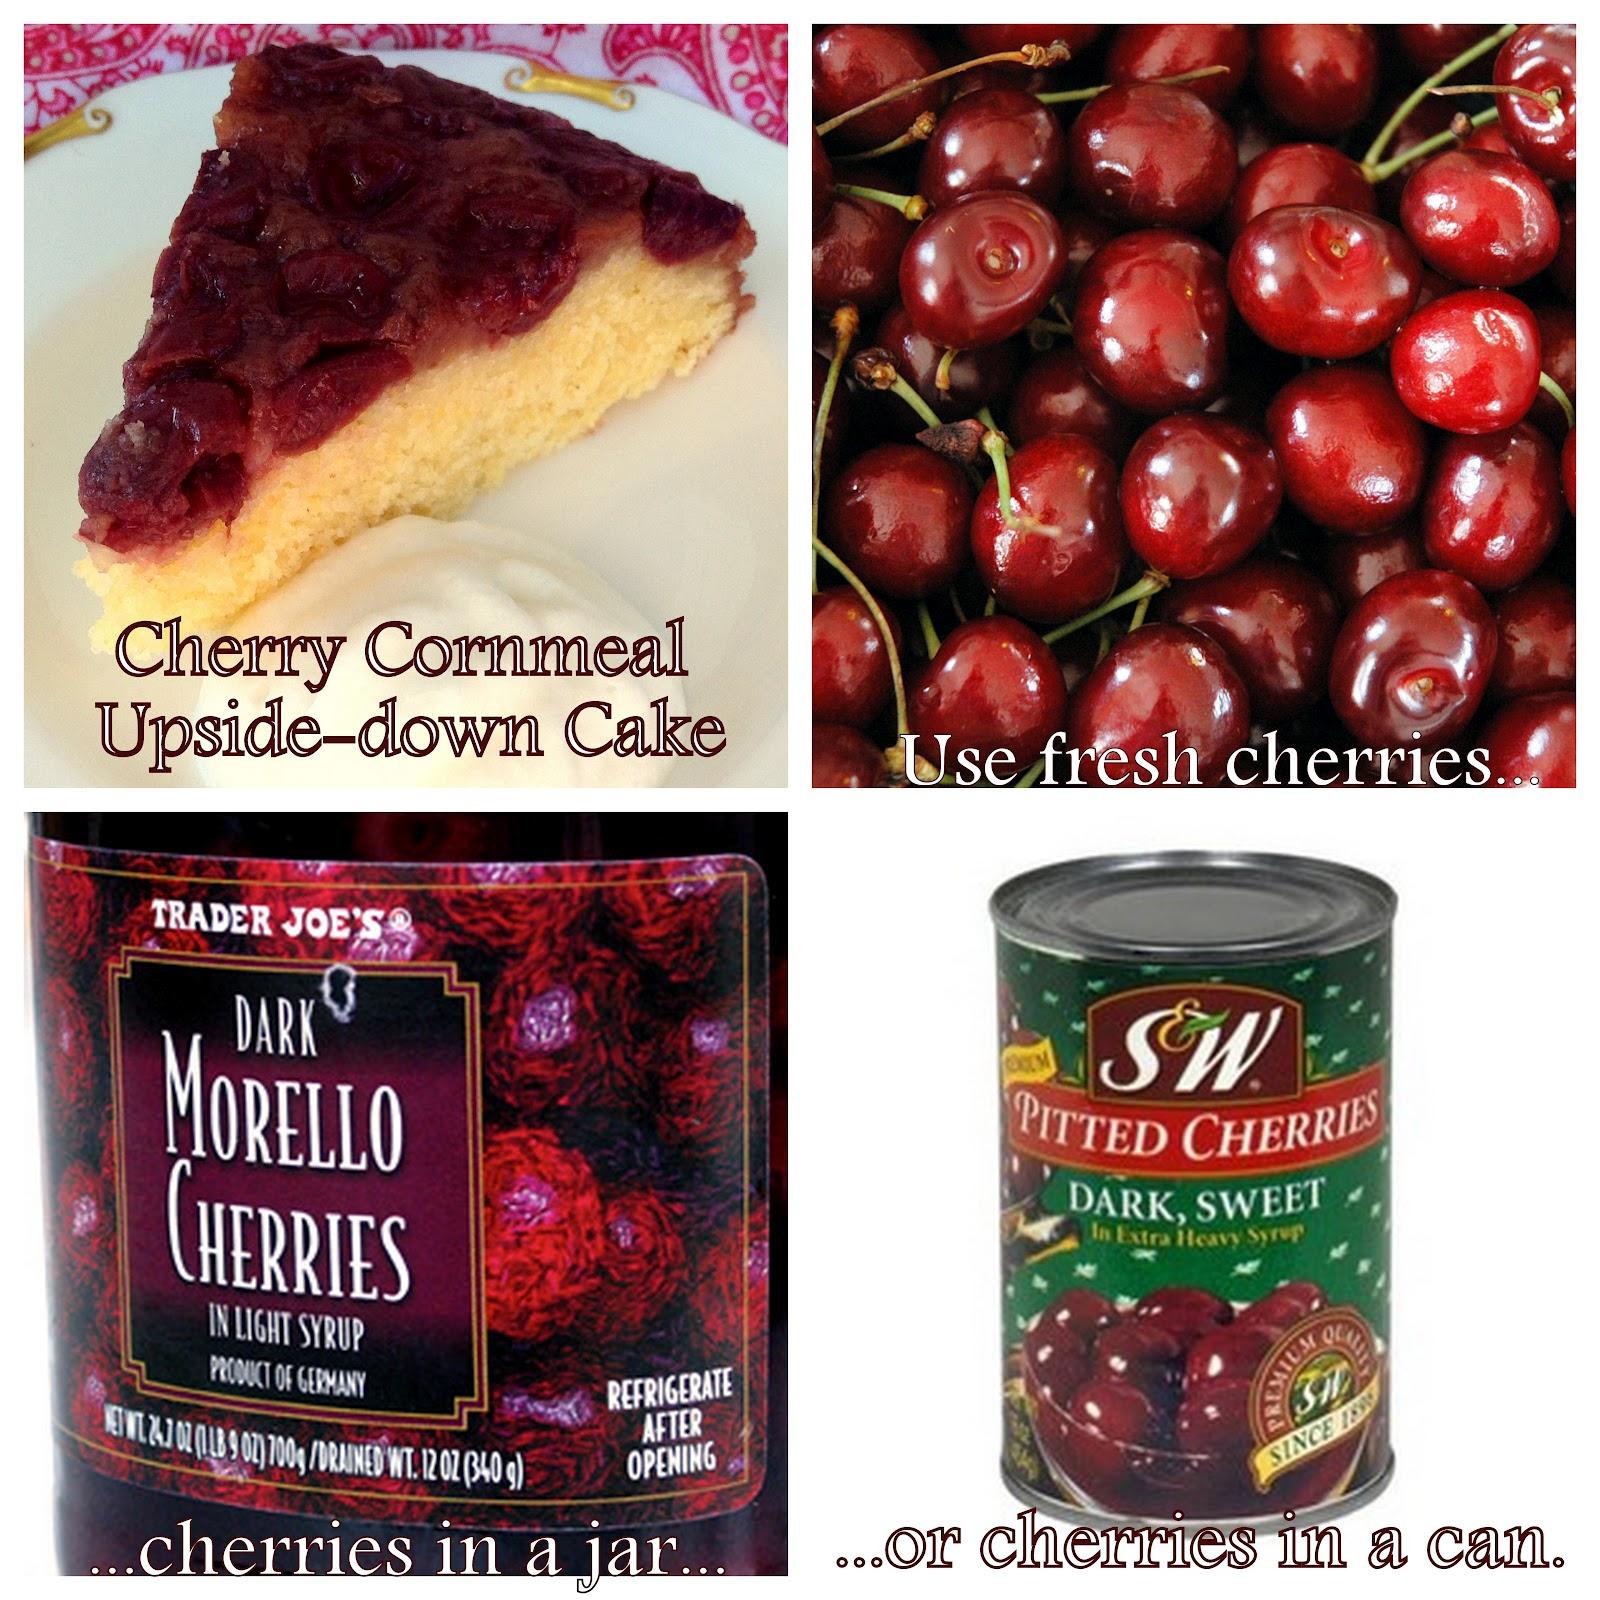 Jennuine by Rook No. 17*: Skillet Cherry Cornmeal Upside-down Cake